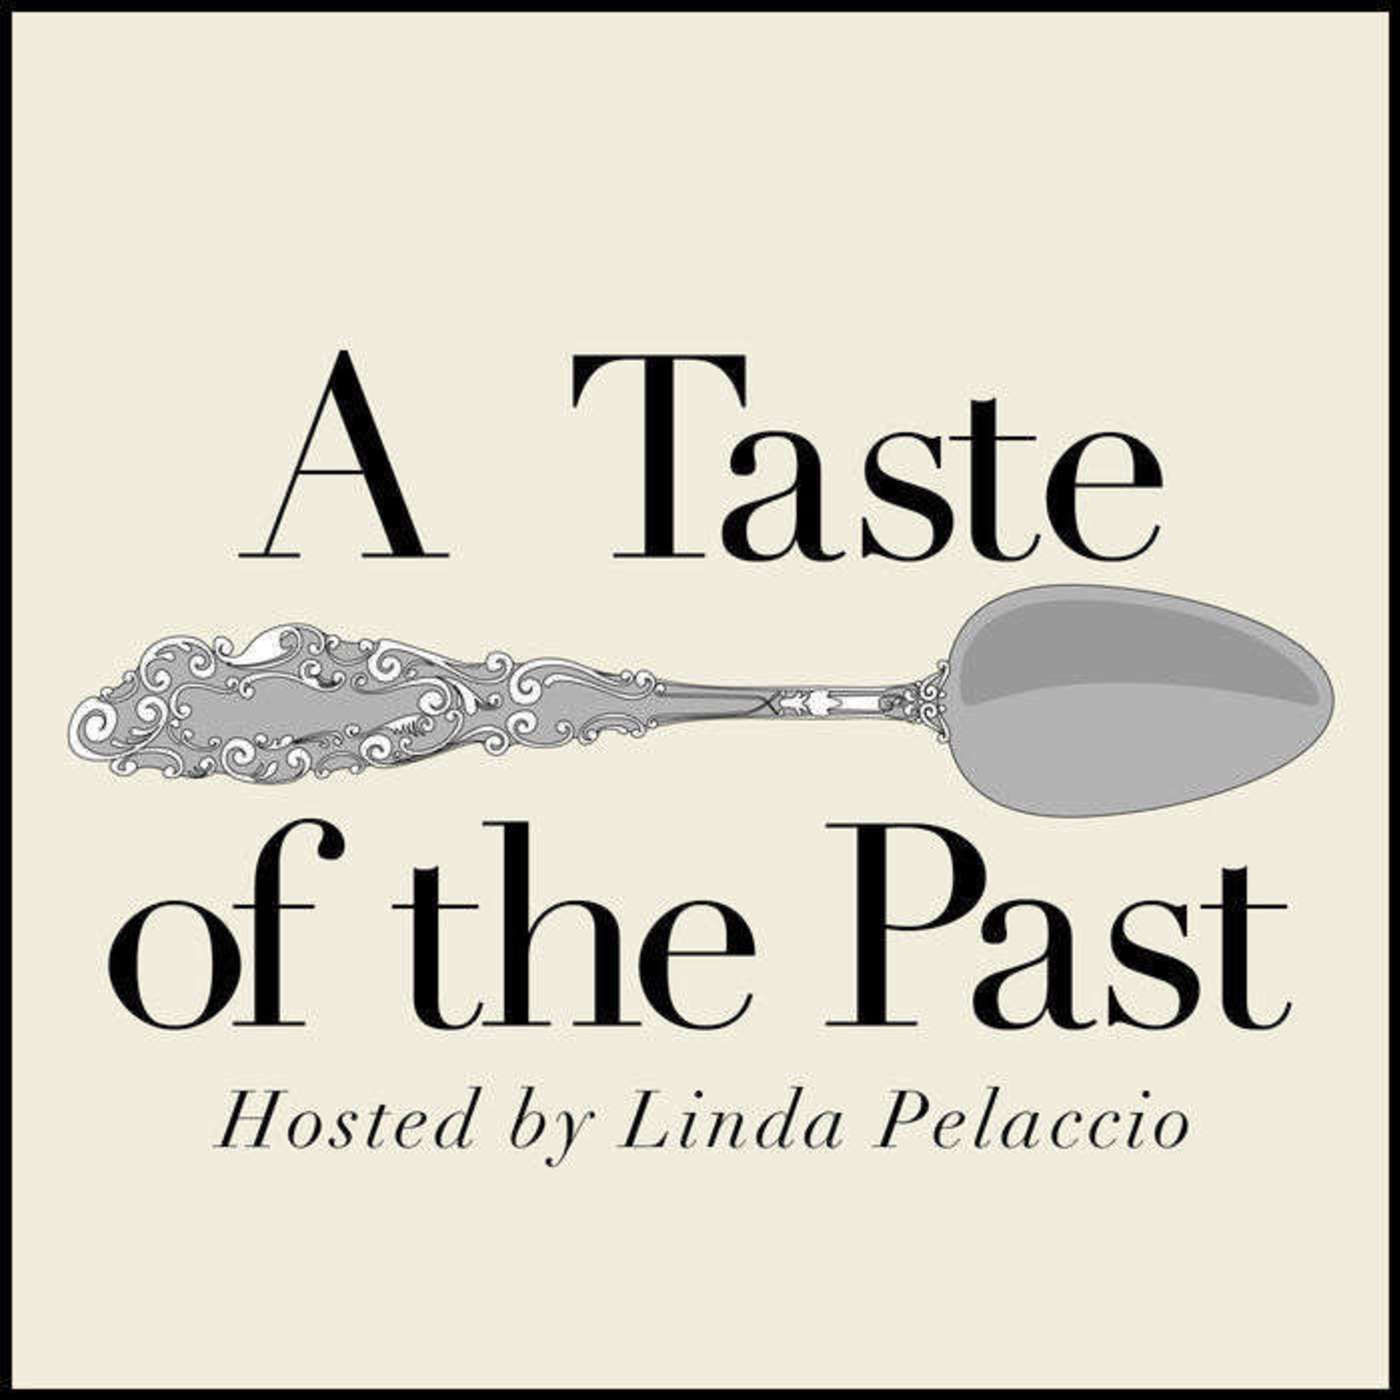 Episode 158: History of Refrigeration